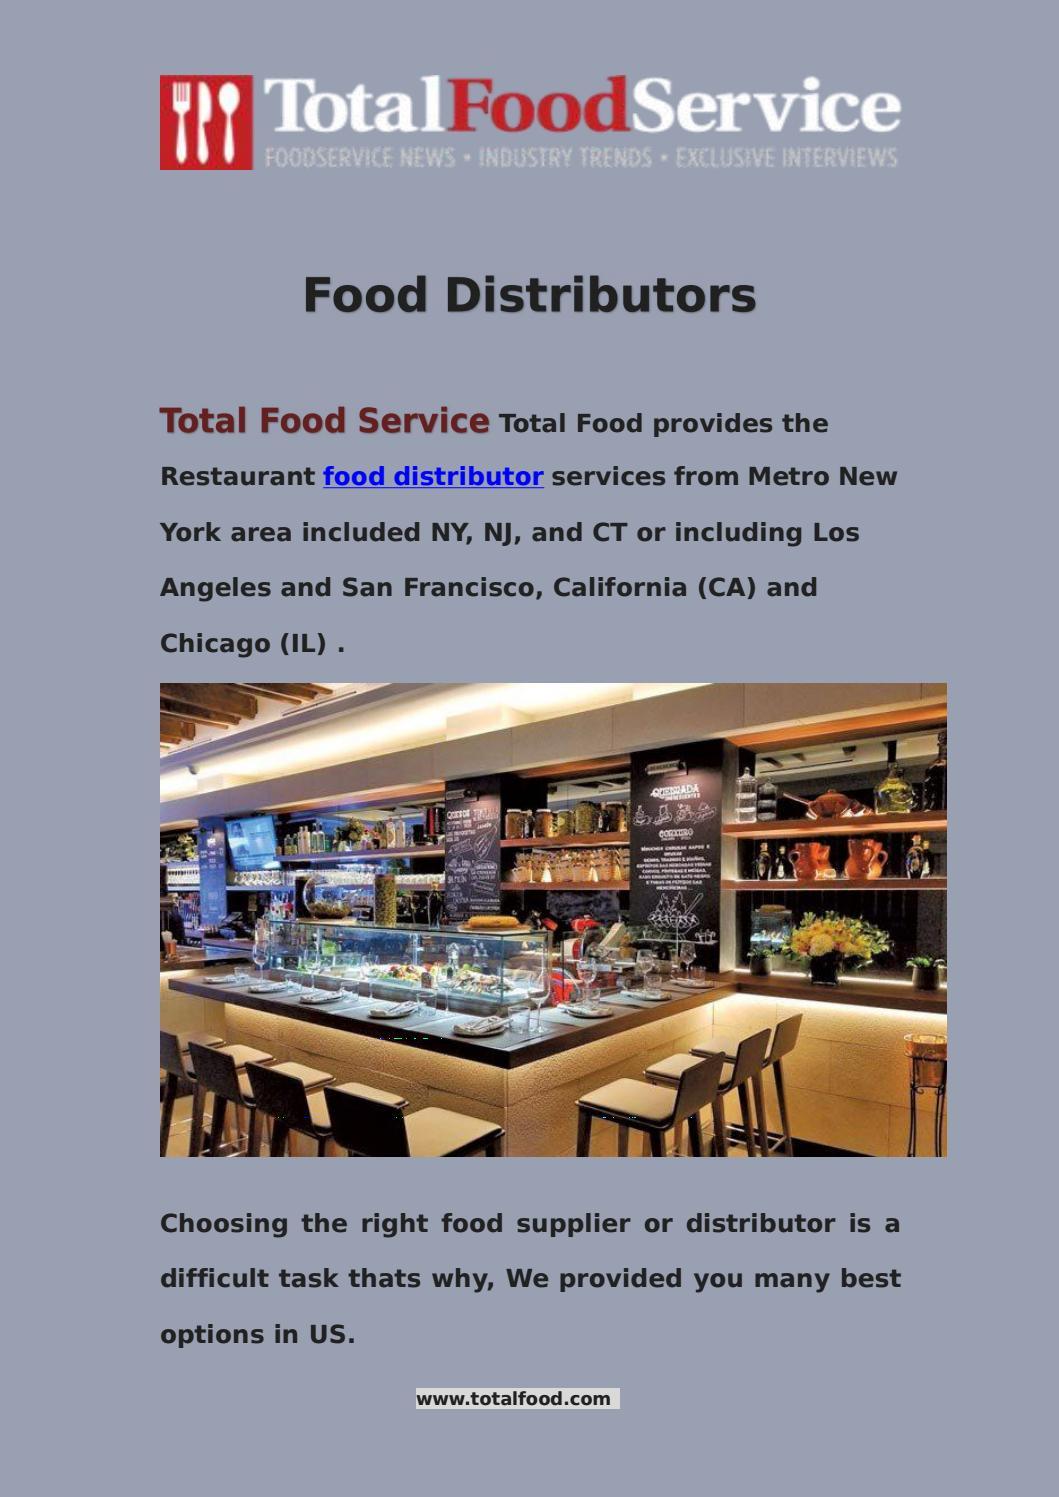 Food distributors - Total Food Services by Total Food